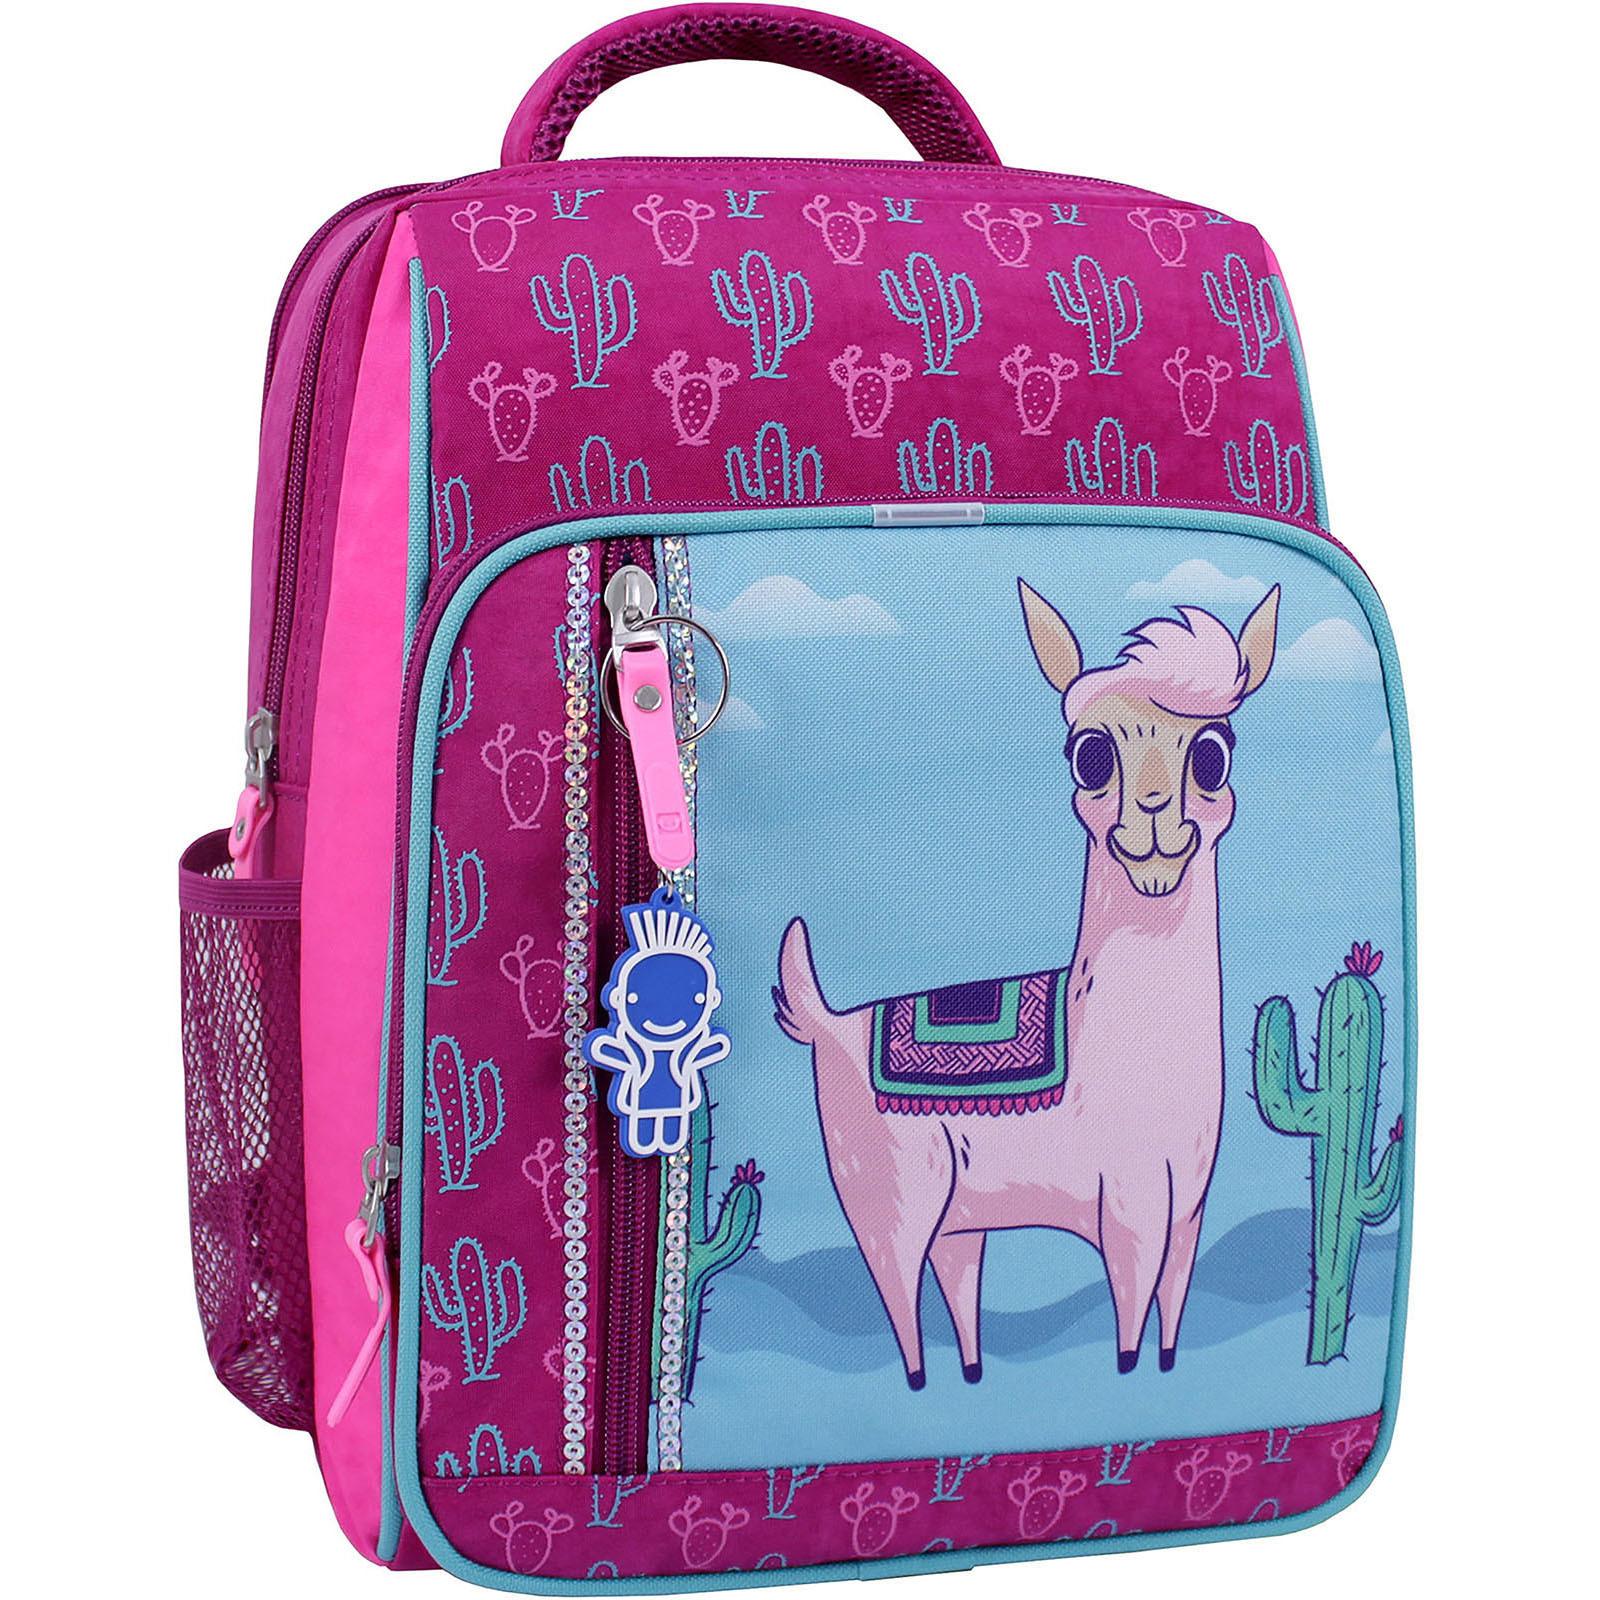 Школьные рюкзаки Рюкзак школьный Bagland Школьник 8 л. 143 малина 617 (00112702) IMG_1570_суб.617_.JPG